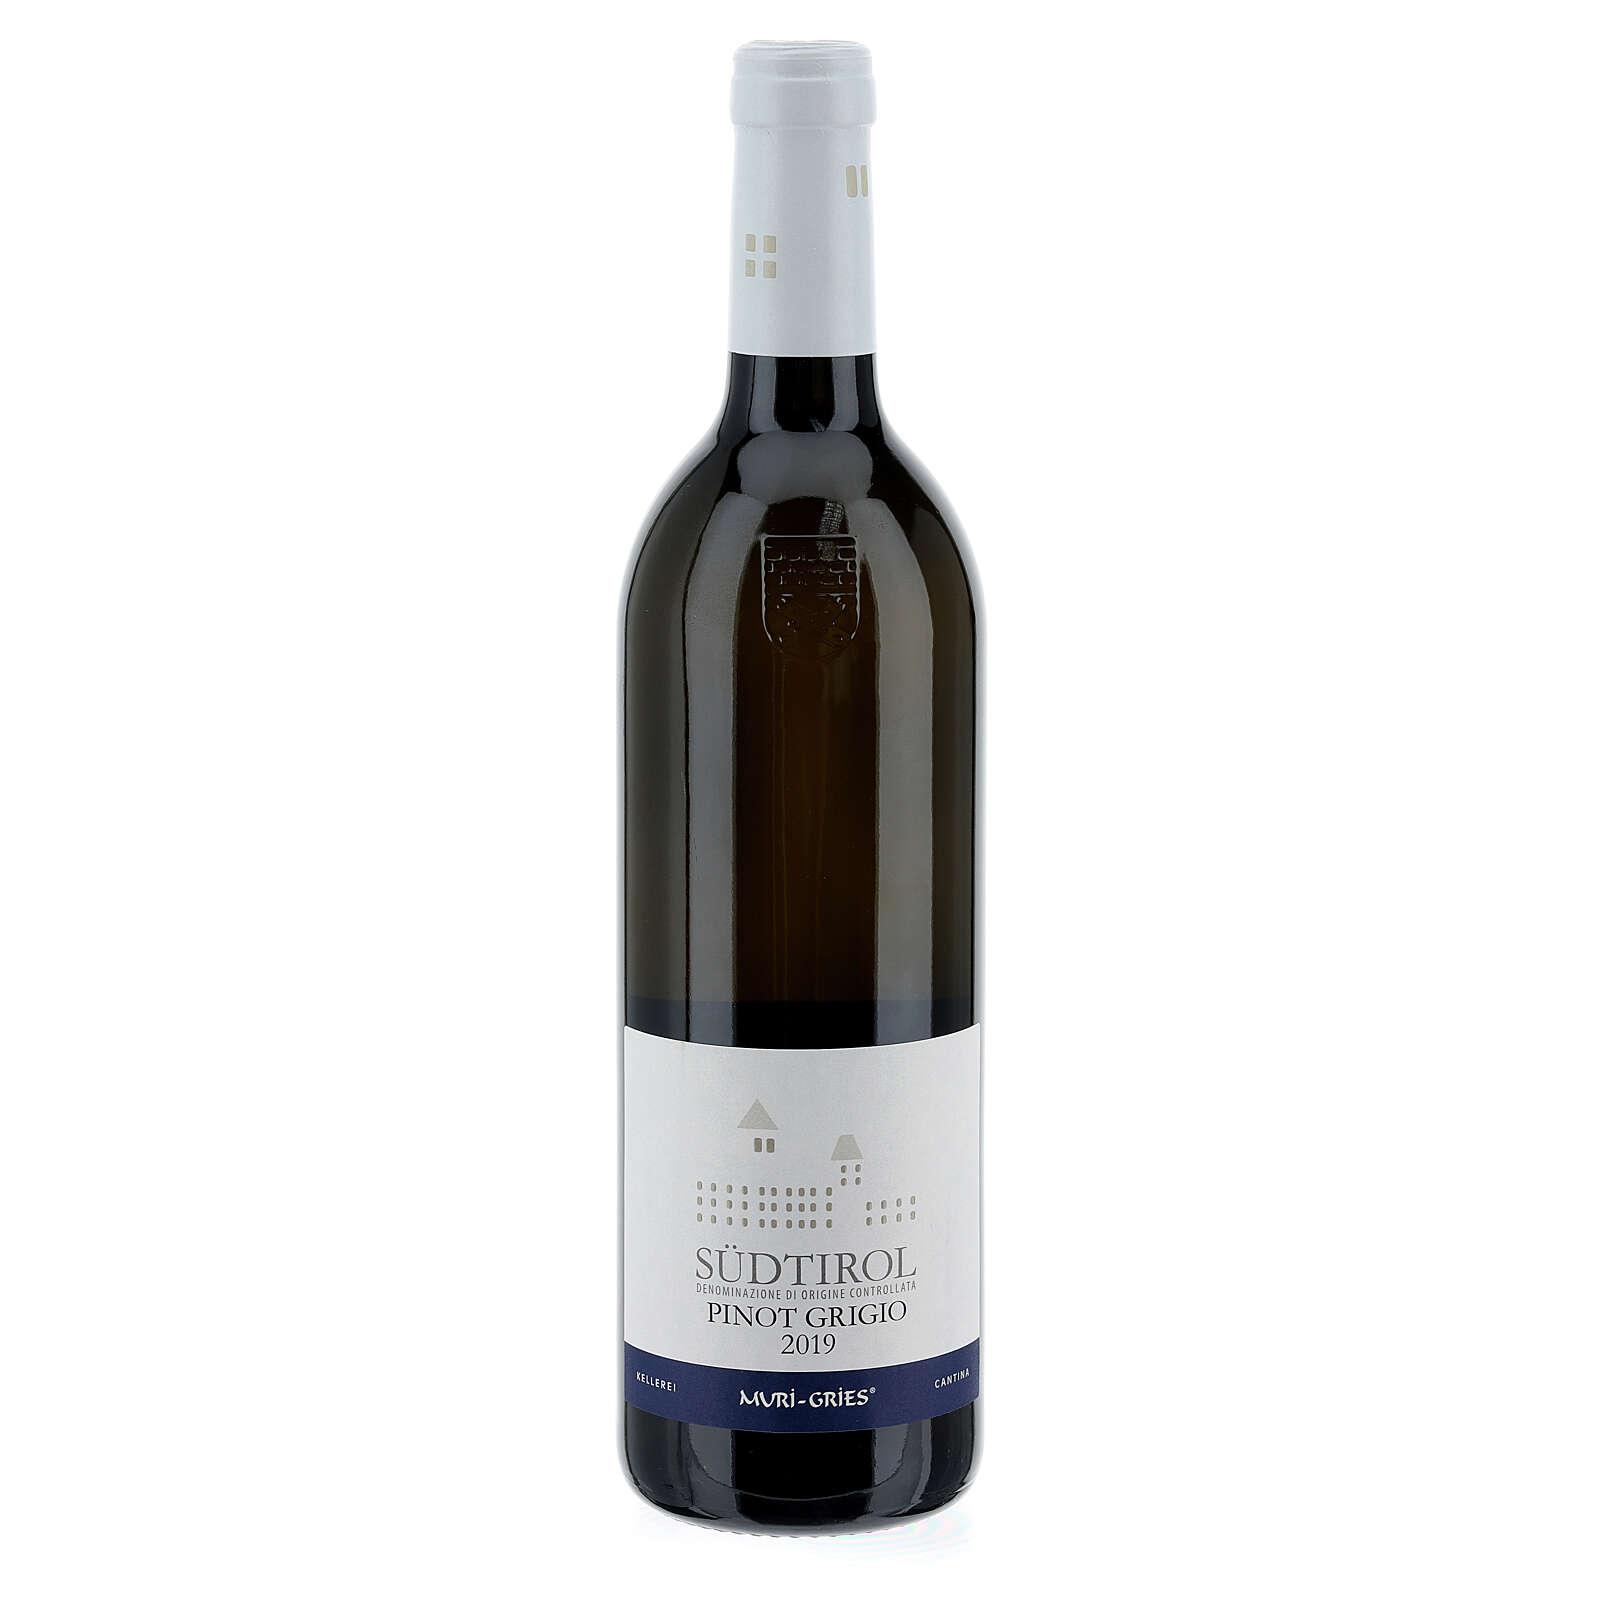 Vino Pinot Gris DOC 2019 Abadía Muri Gries 3